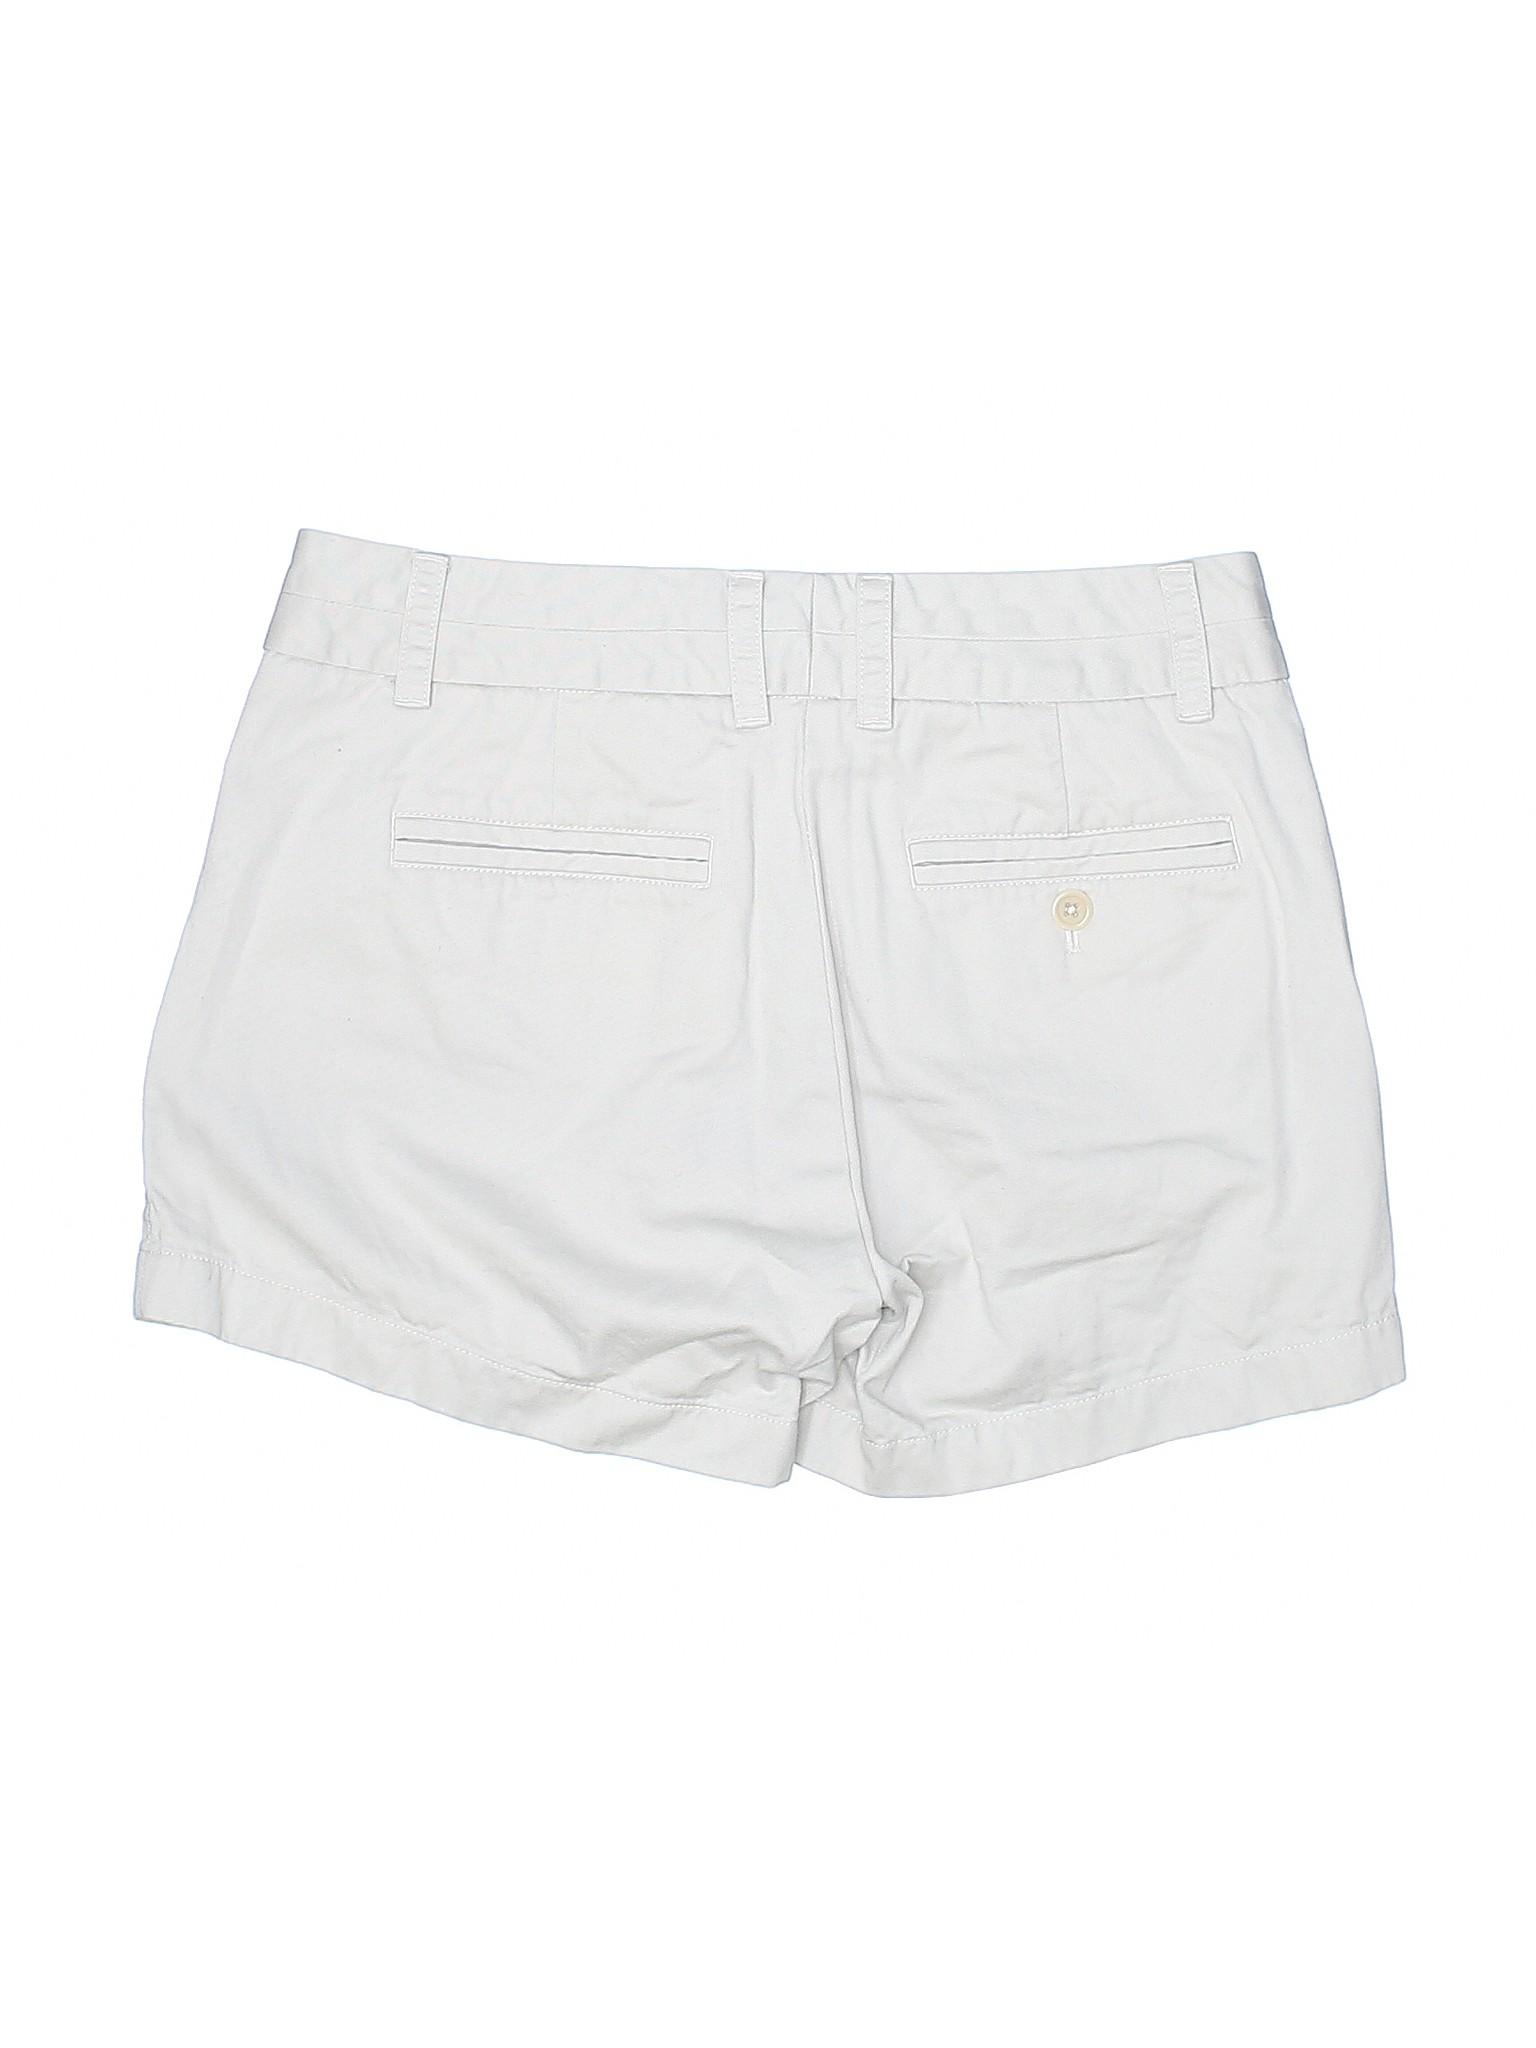 leisure Crew Boutique Khaki J Shorts pYqxBpd7nR